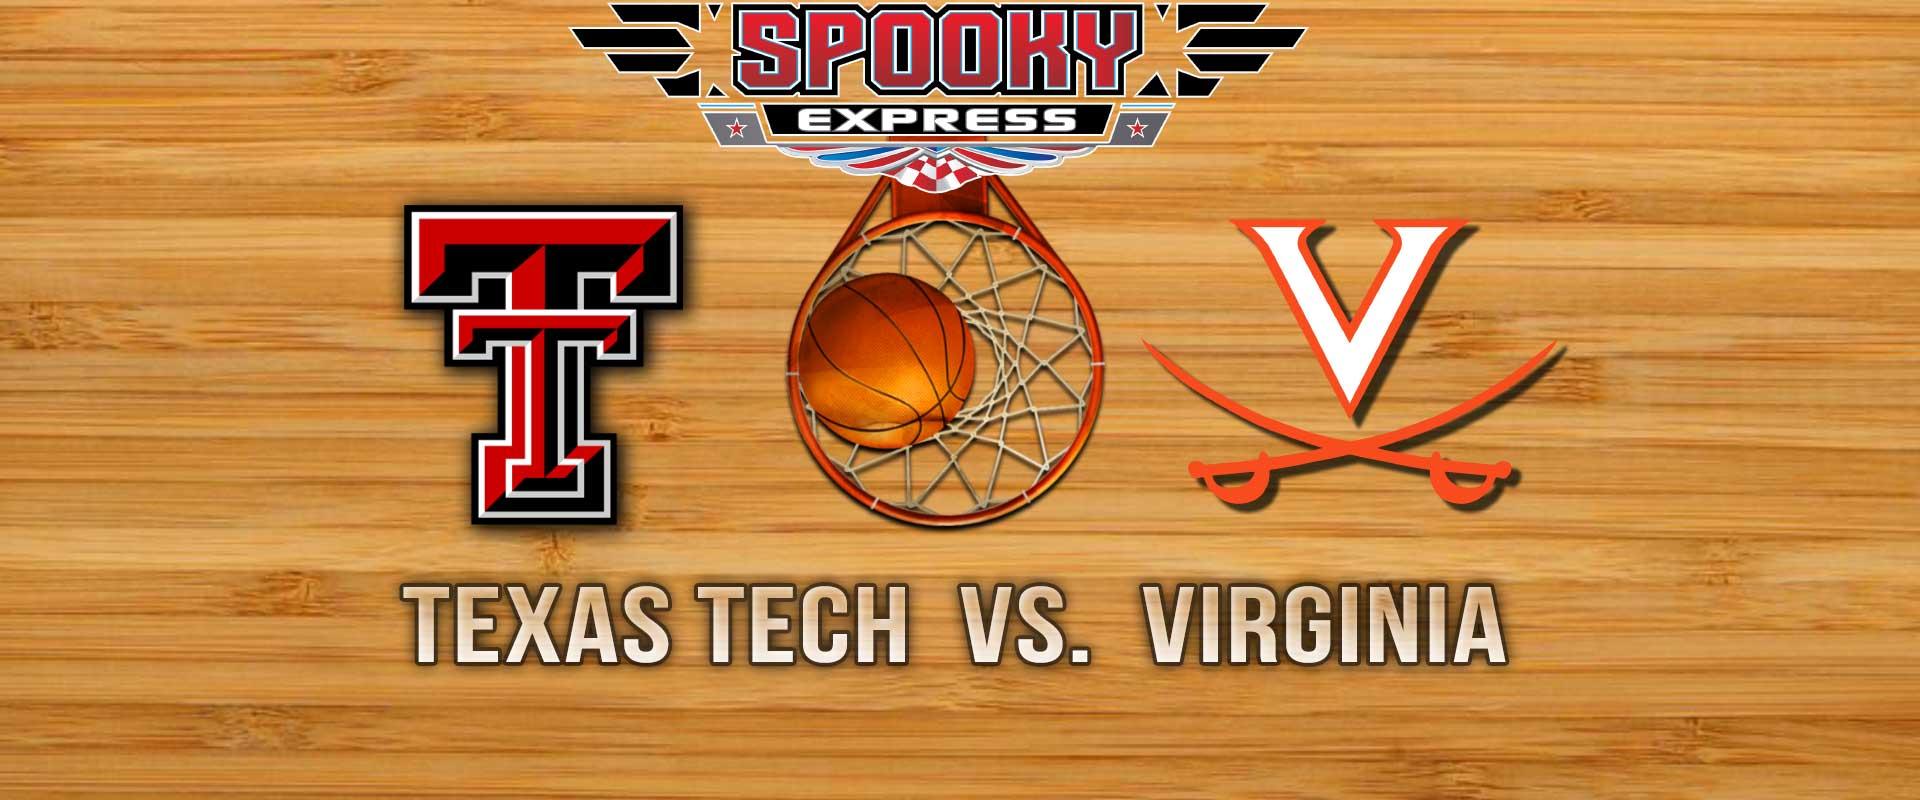 NCAA Tournament Finals Betting Preview: Texas Tech vs